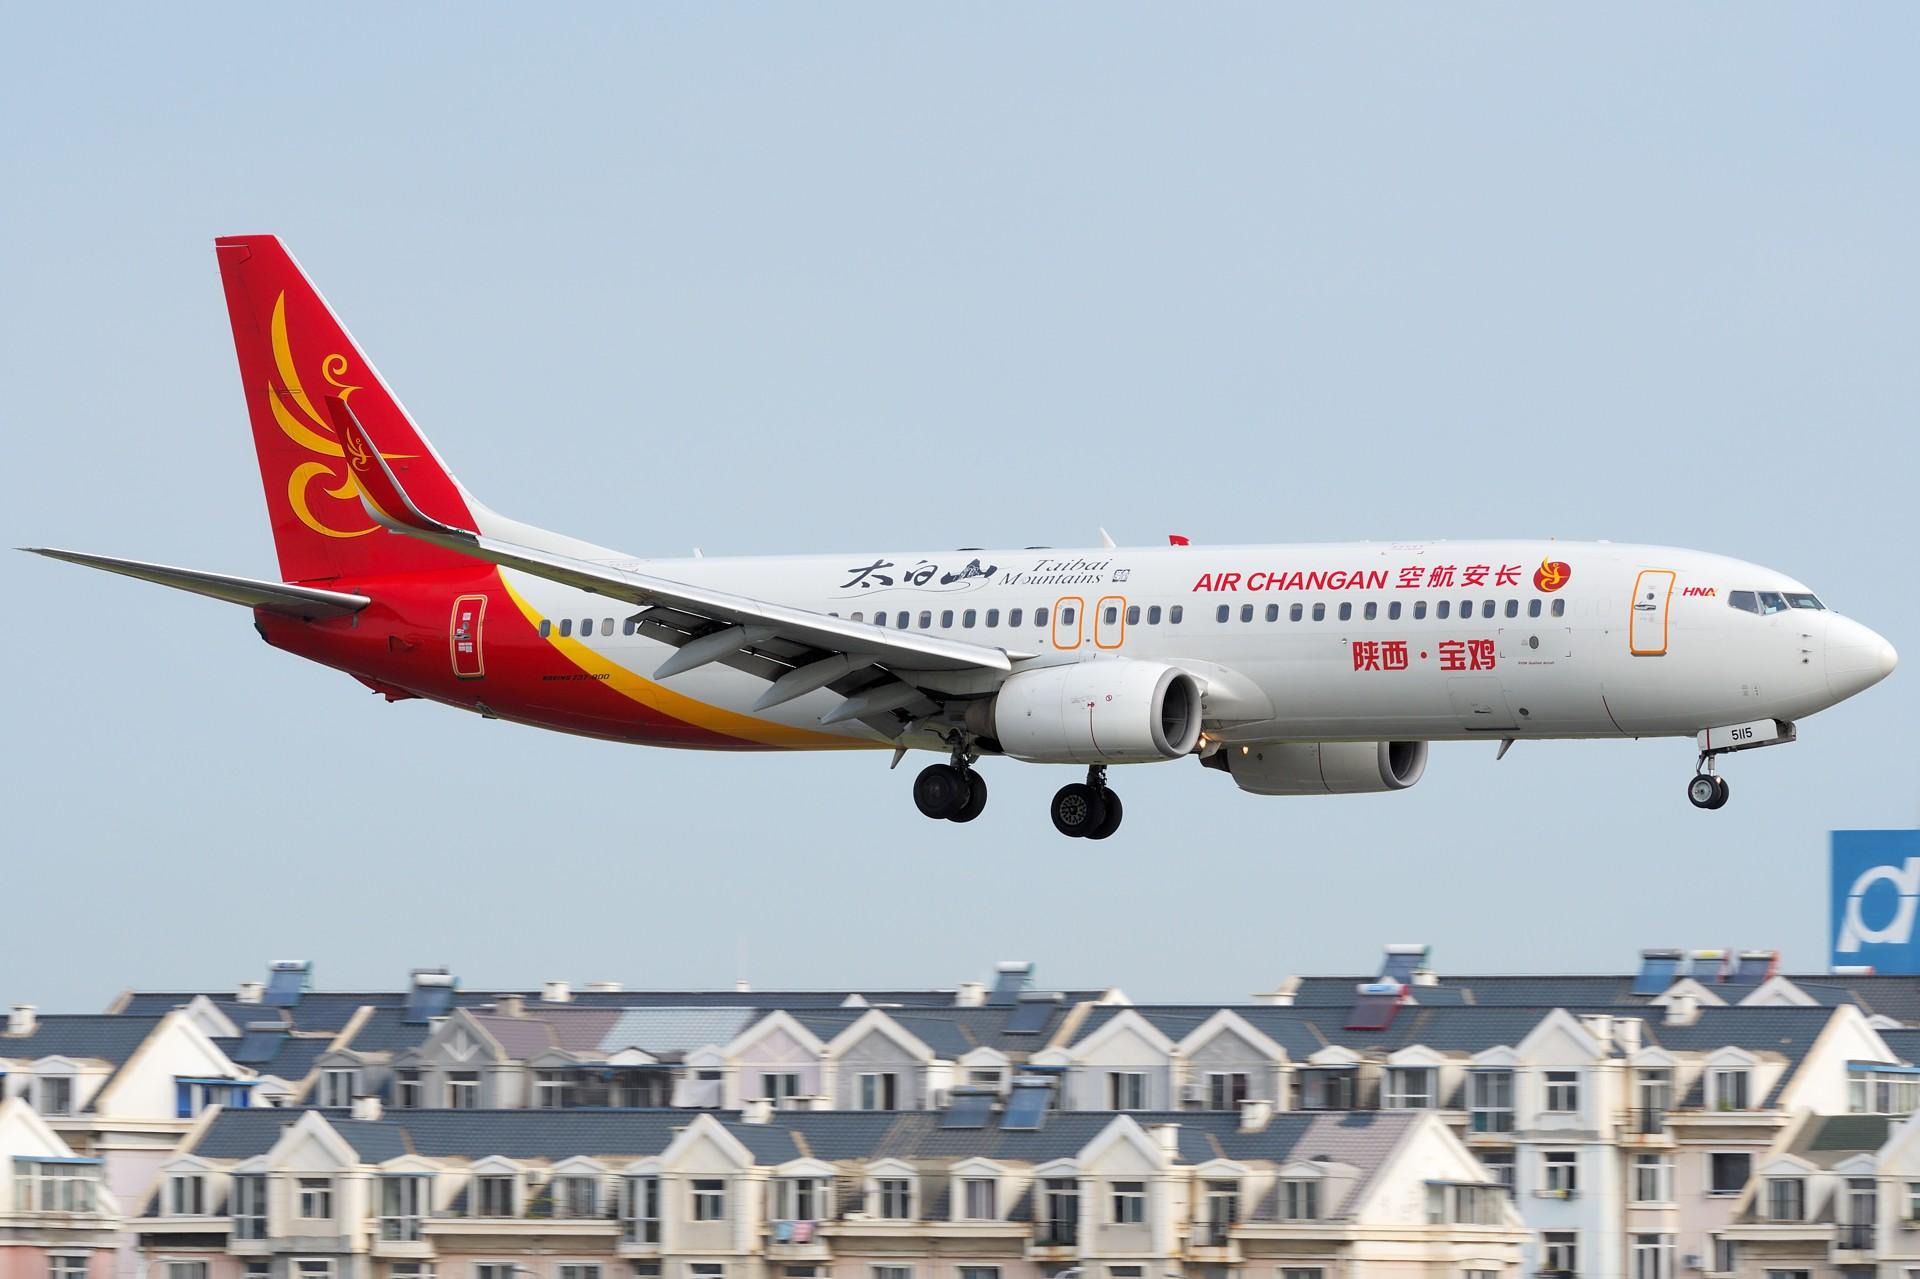 Re:[原创]★[DLC]一点有趣的事情(国庆加点儿料)★ BOEING 737-800 B-5115 中国大连国际机场